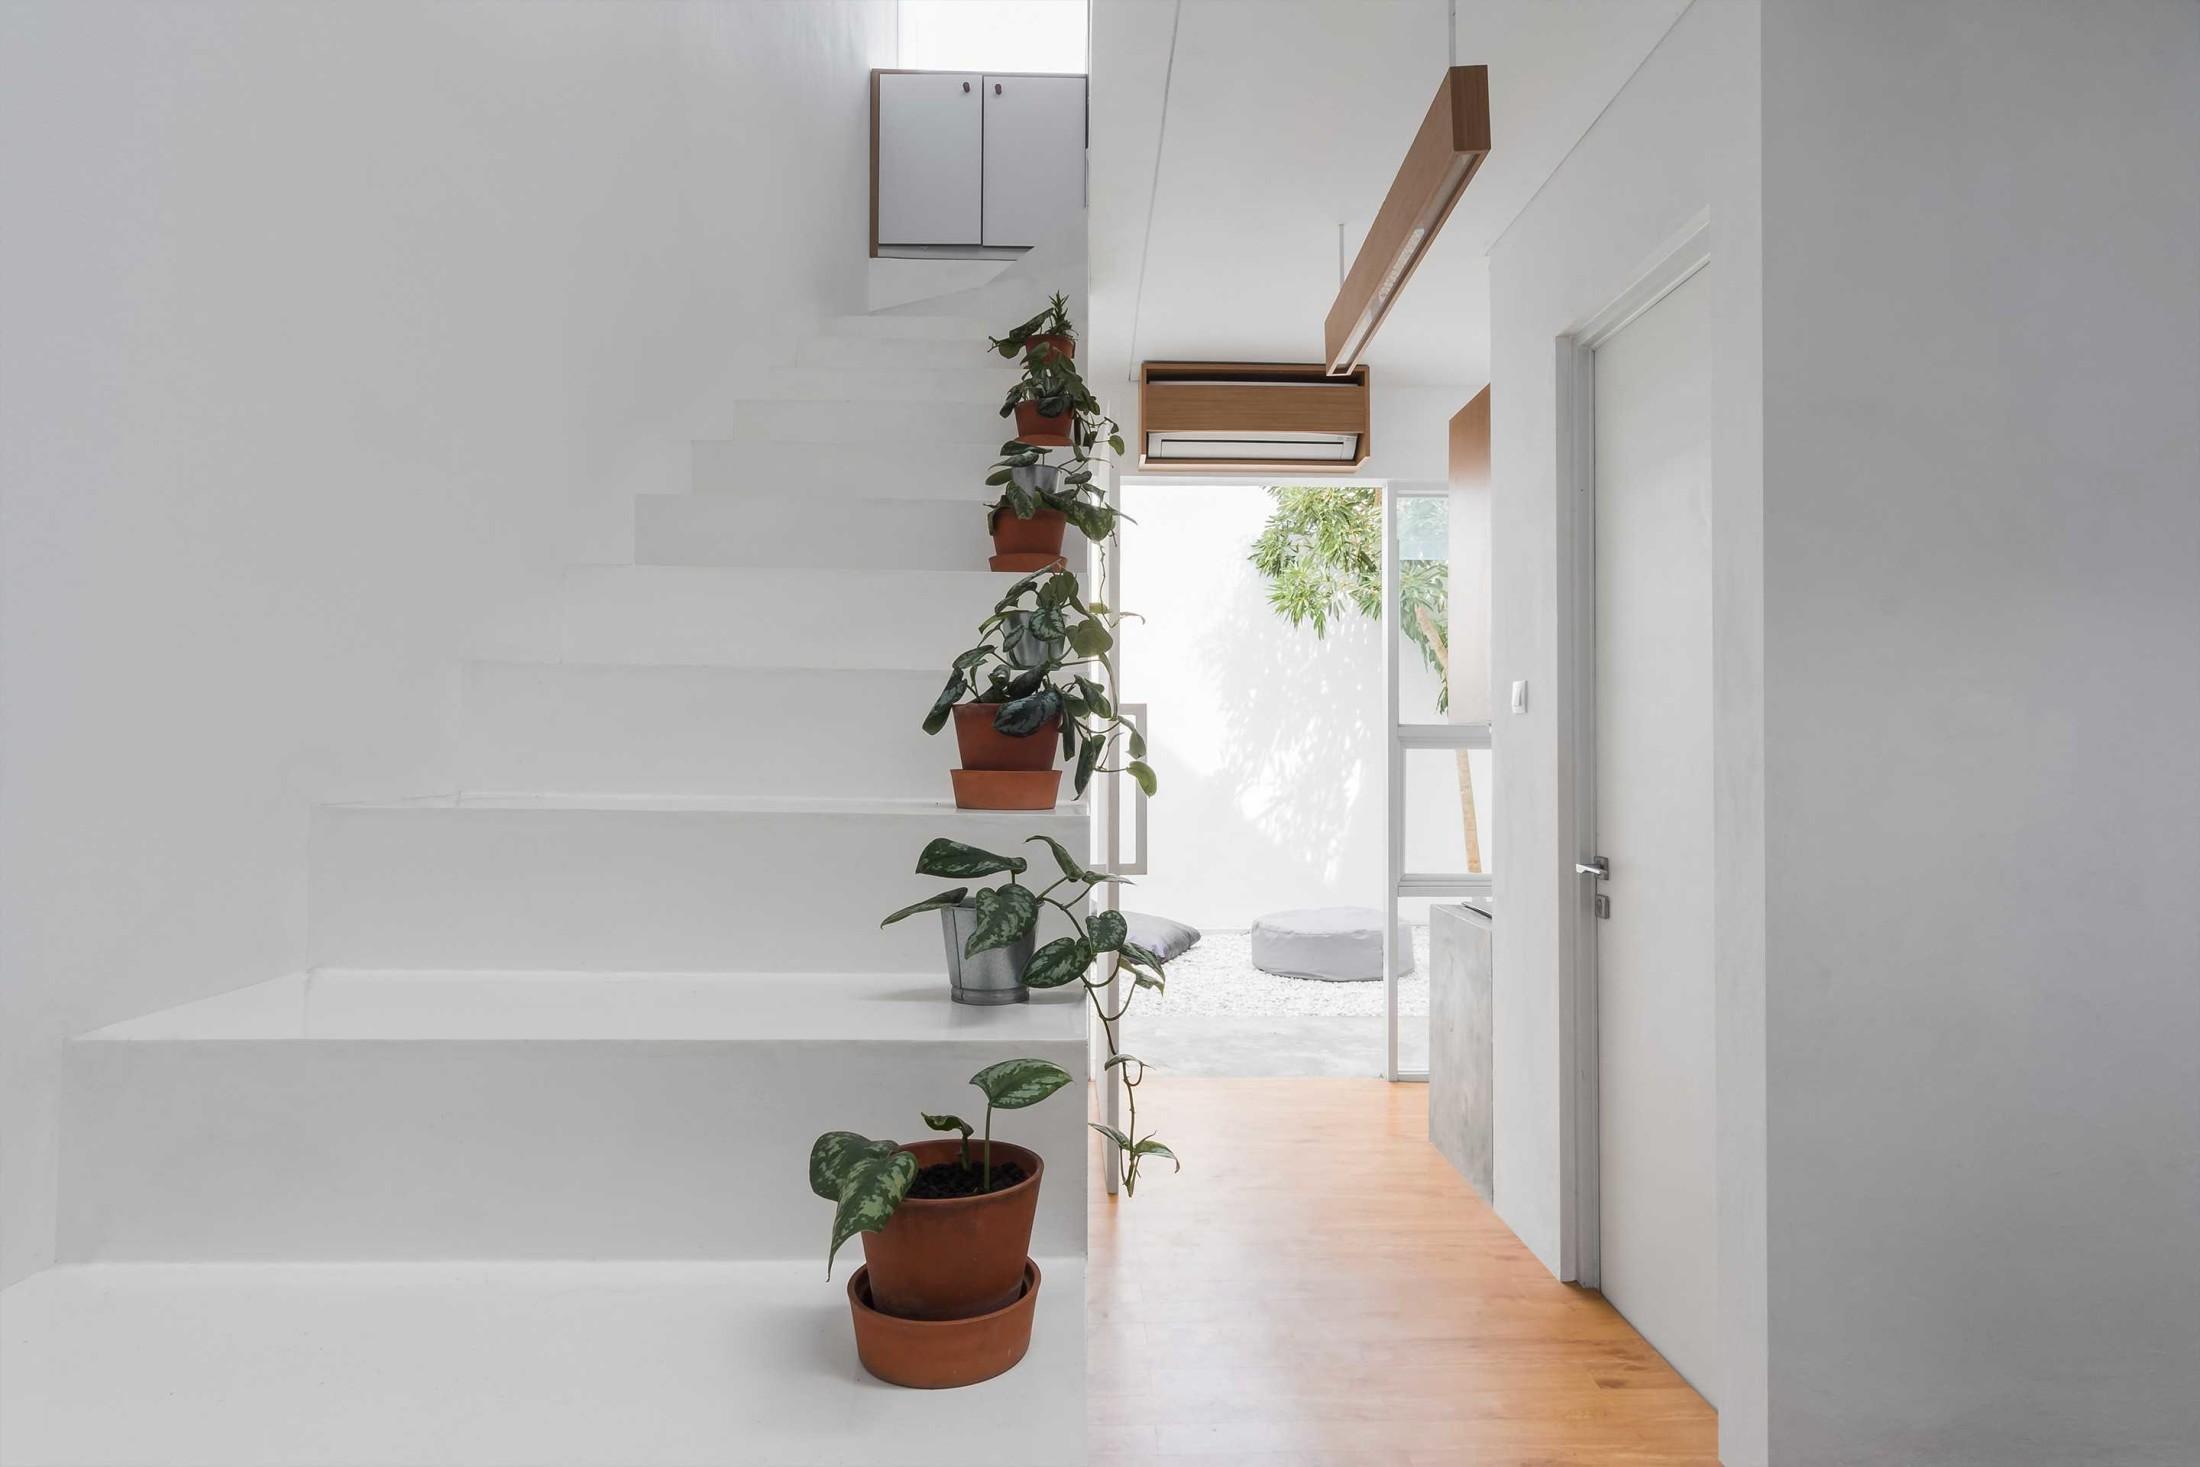 Tanaman dalam pot sebagai pembatas visual dan keamanan di pinggir tangga (Sumber: arsitag.com)